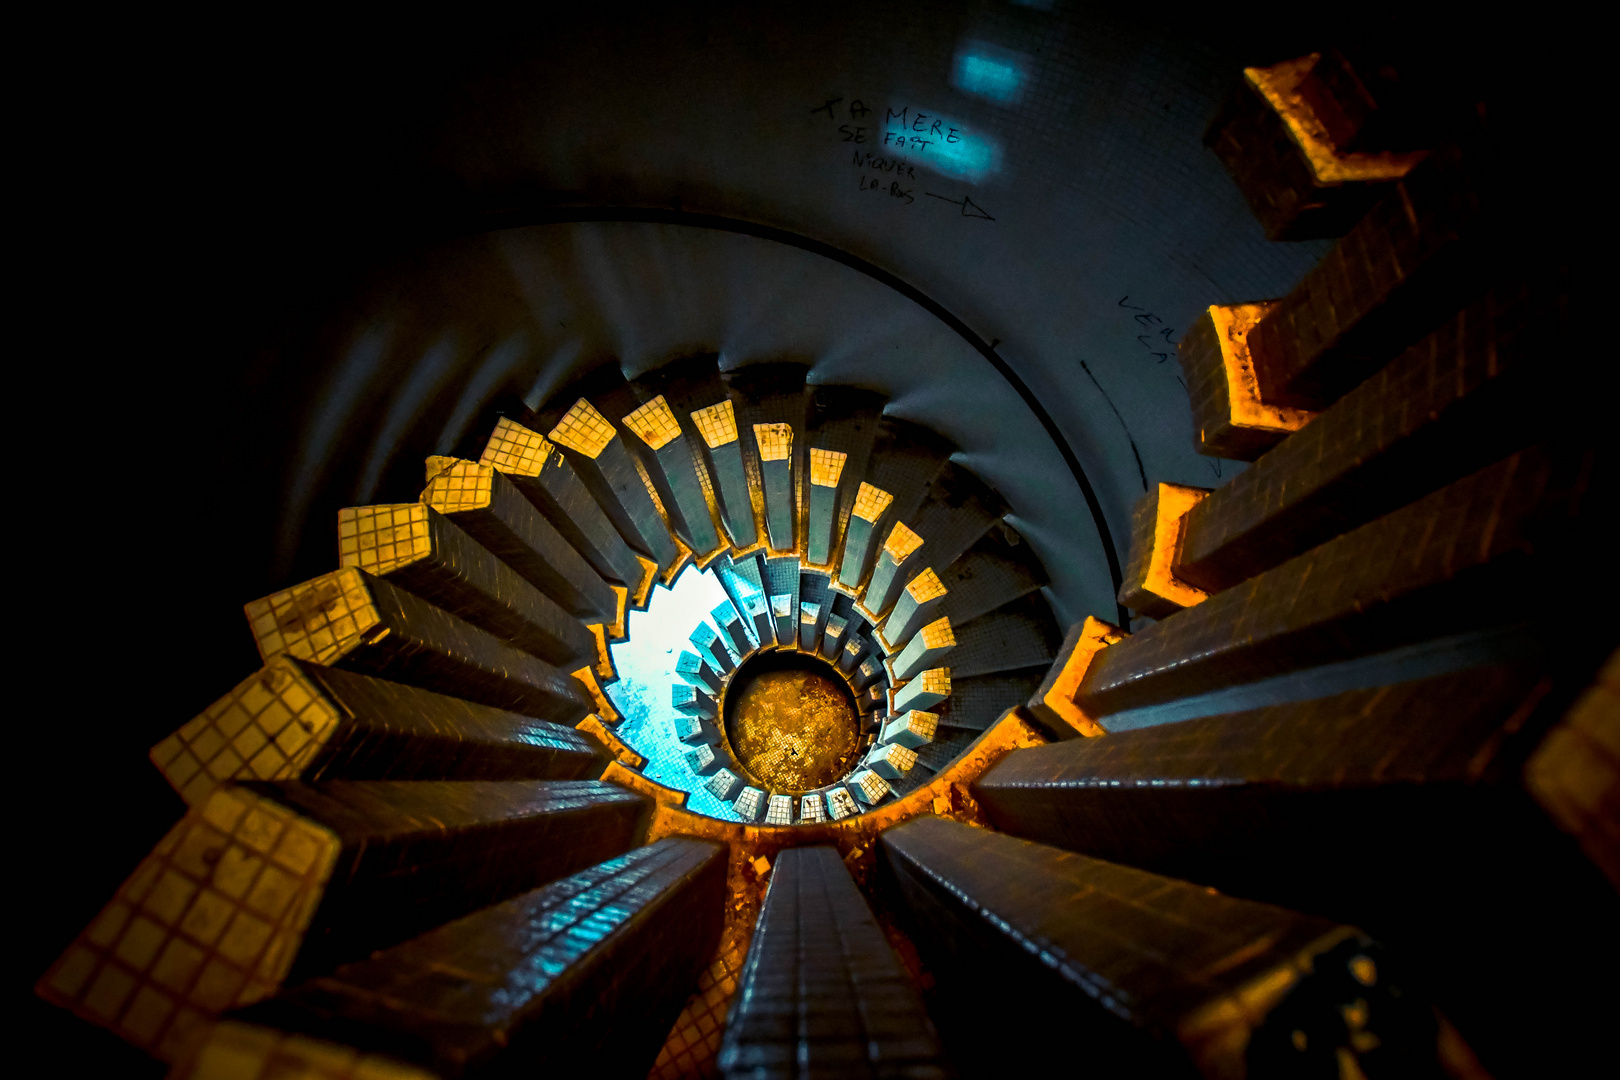 escalier en colimaçon Foto & Bild | architektur, marodes ...